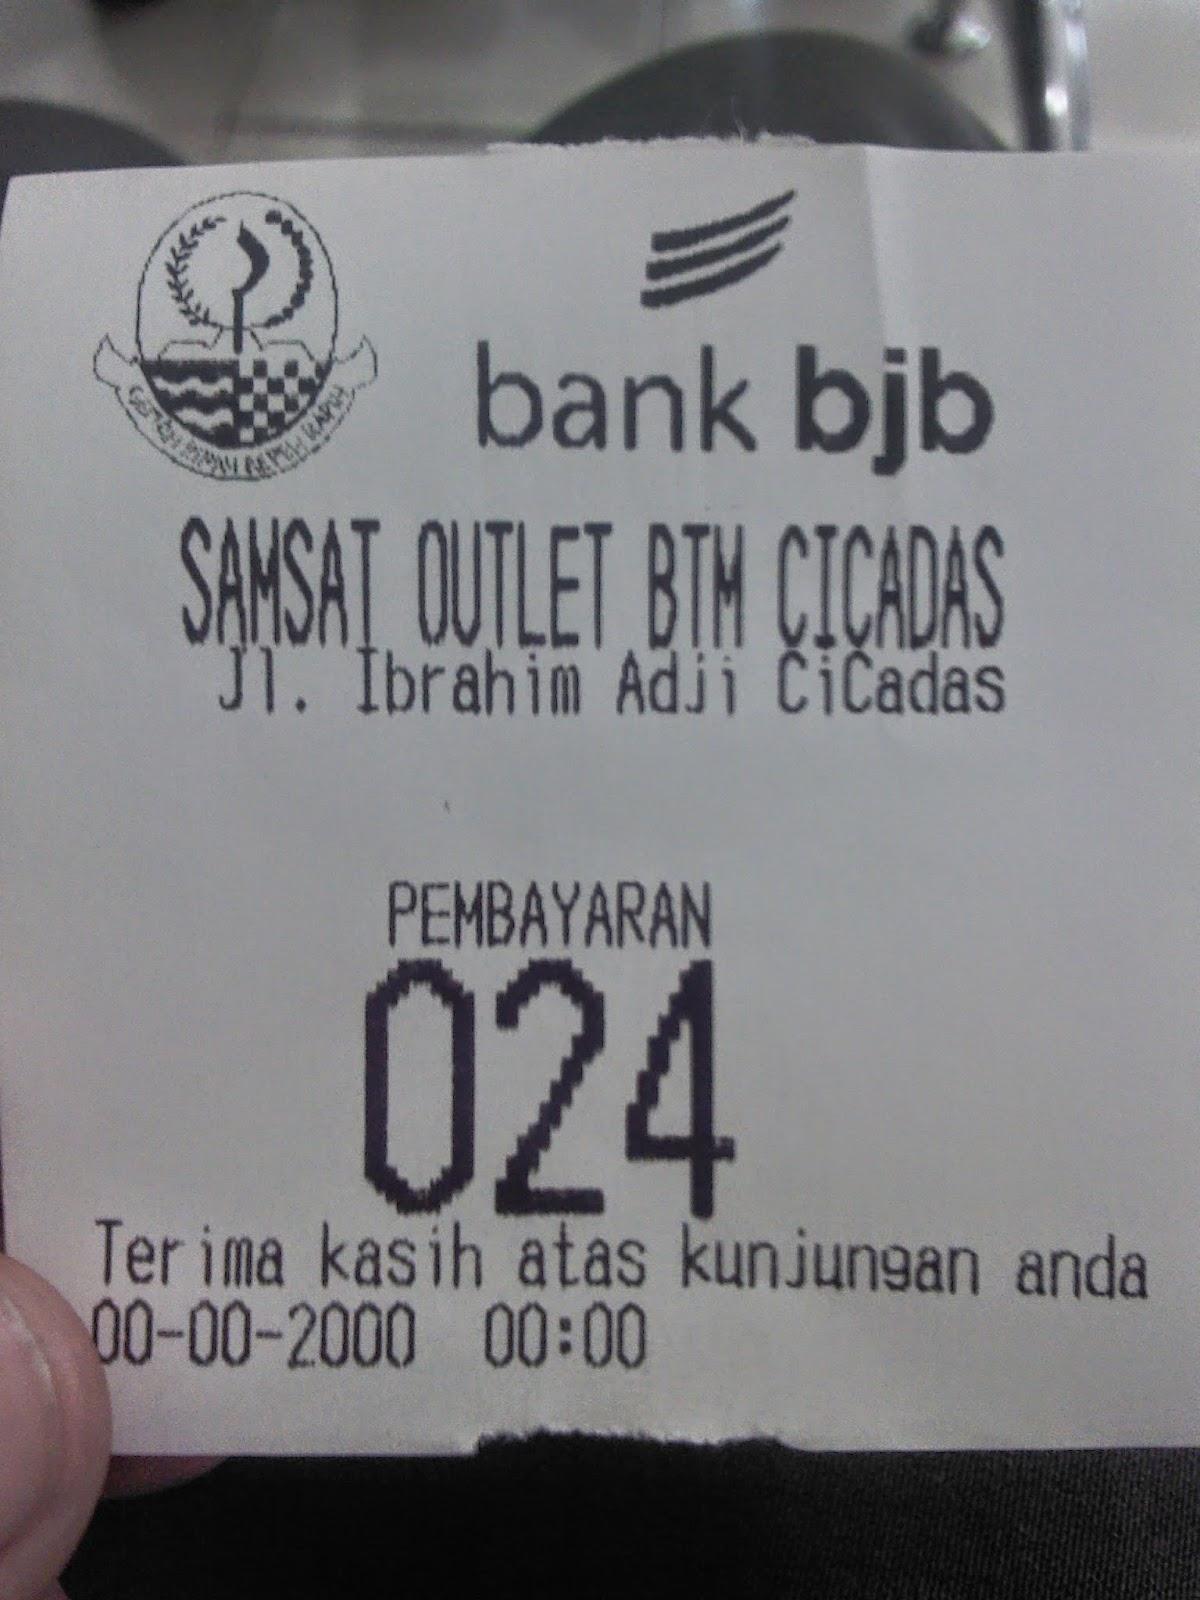 Membayar Pajak Motor di Samsat Outlet